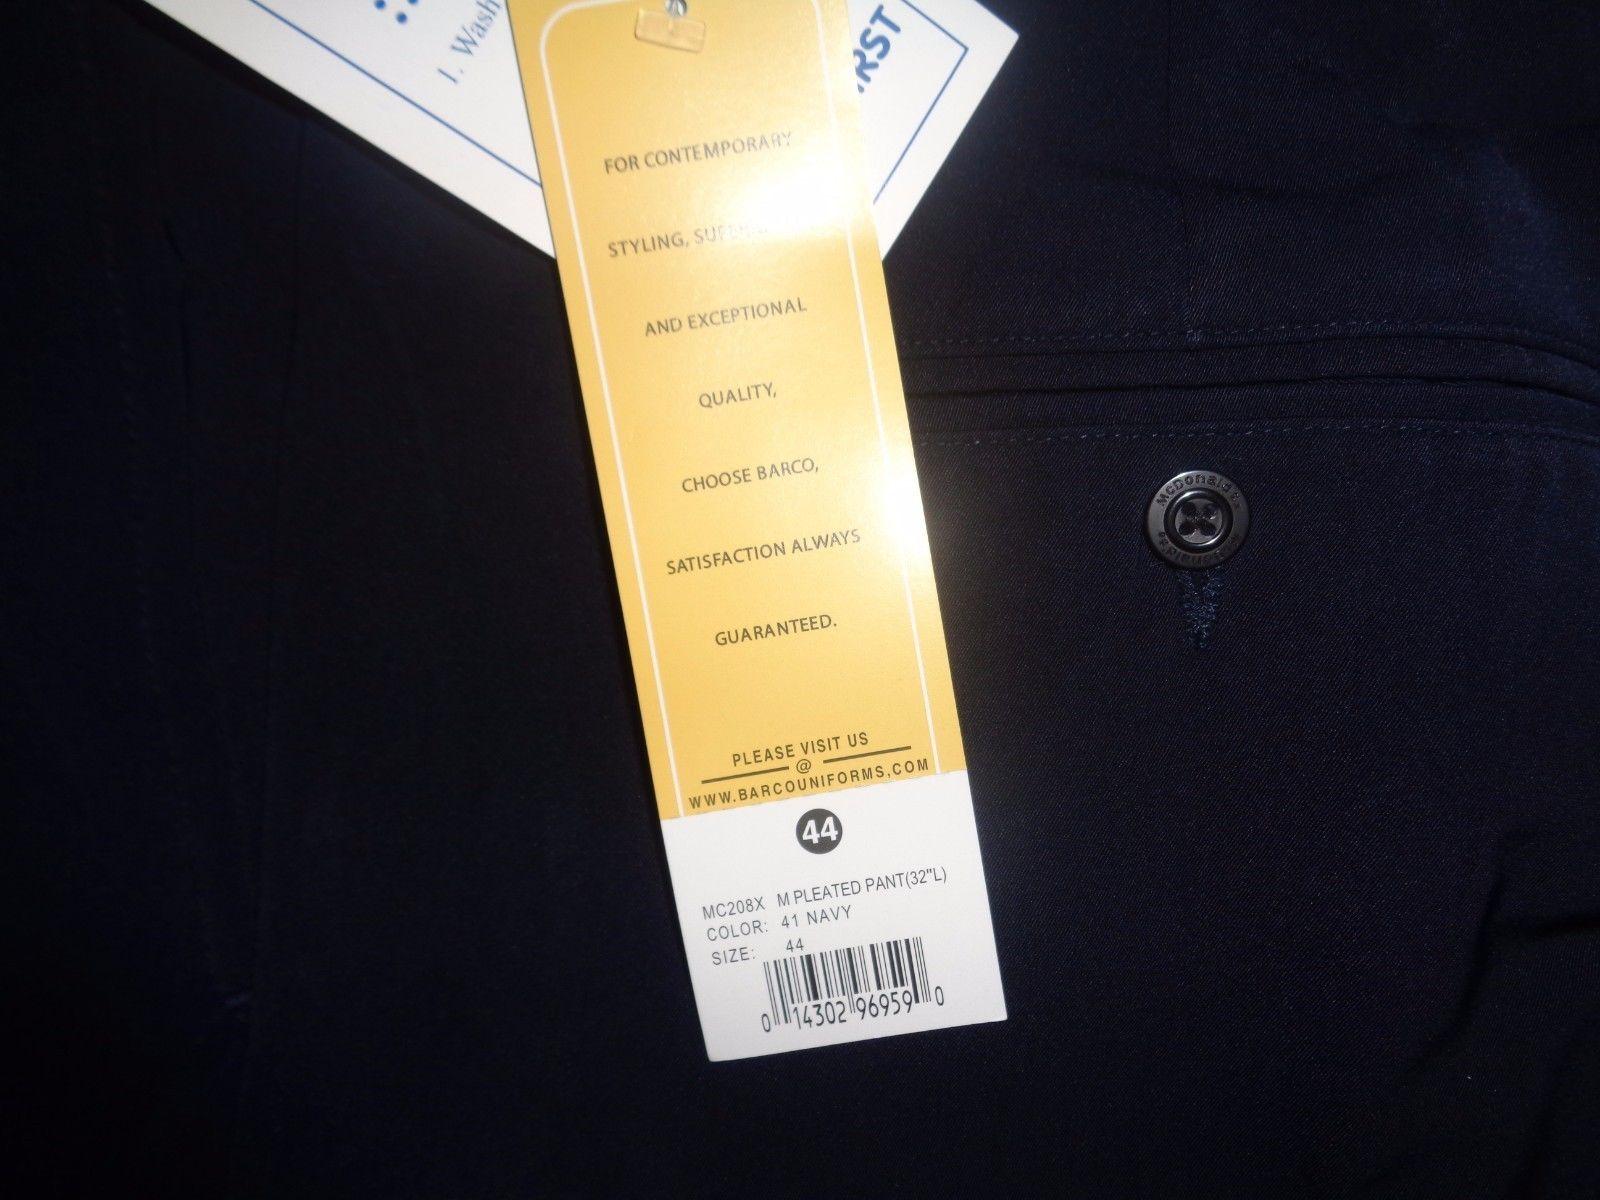 Barco Men's Uniform Navy Blue Work Slacks Pants NWT Sz 44 image 2